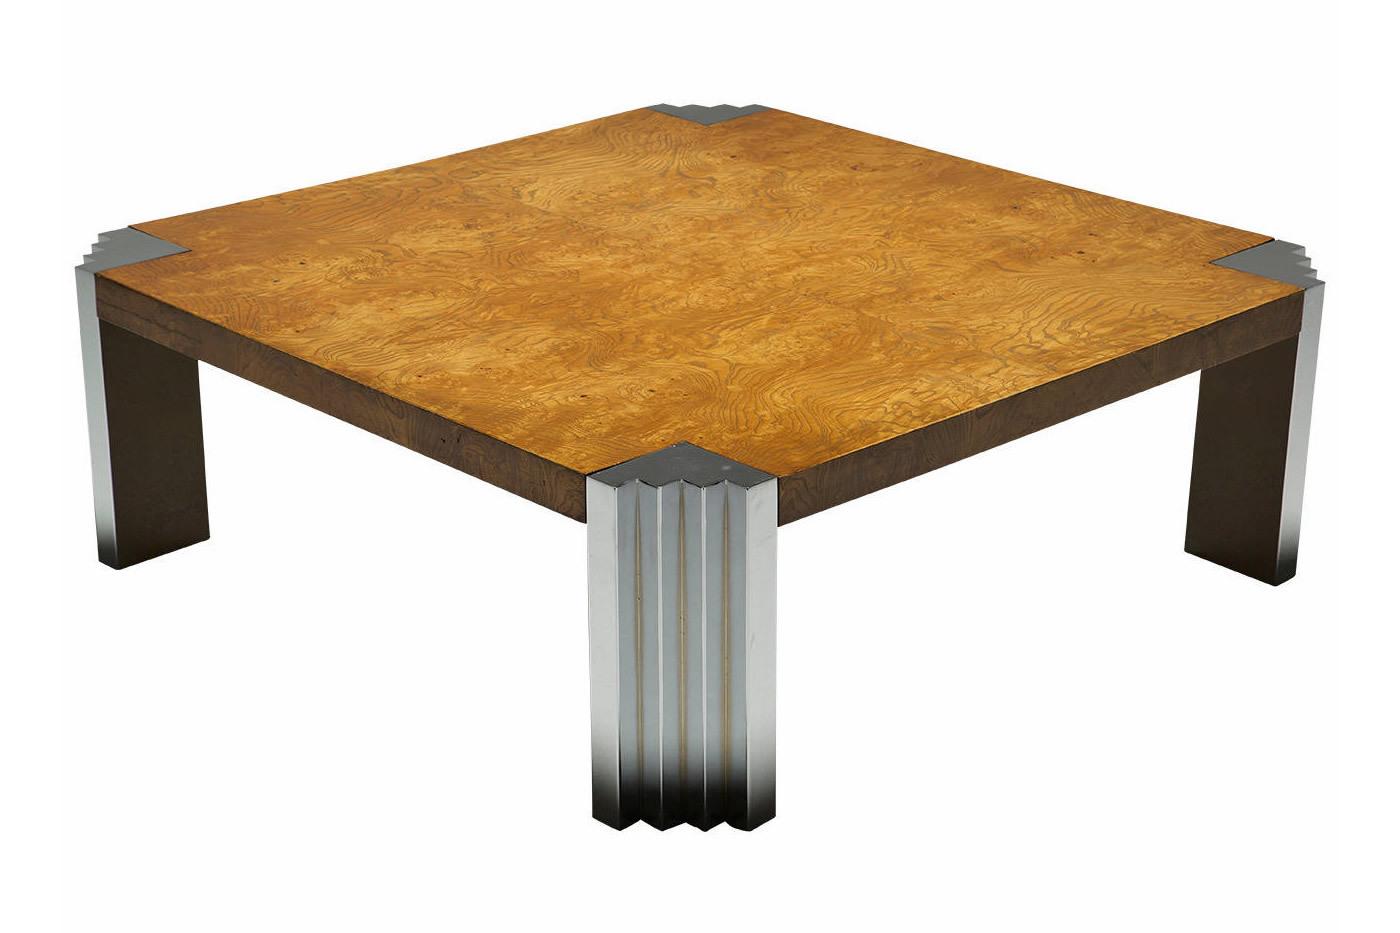 Burr Walnut And Chrome Skyscraper Coffee Table Vinterior